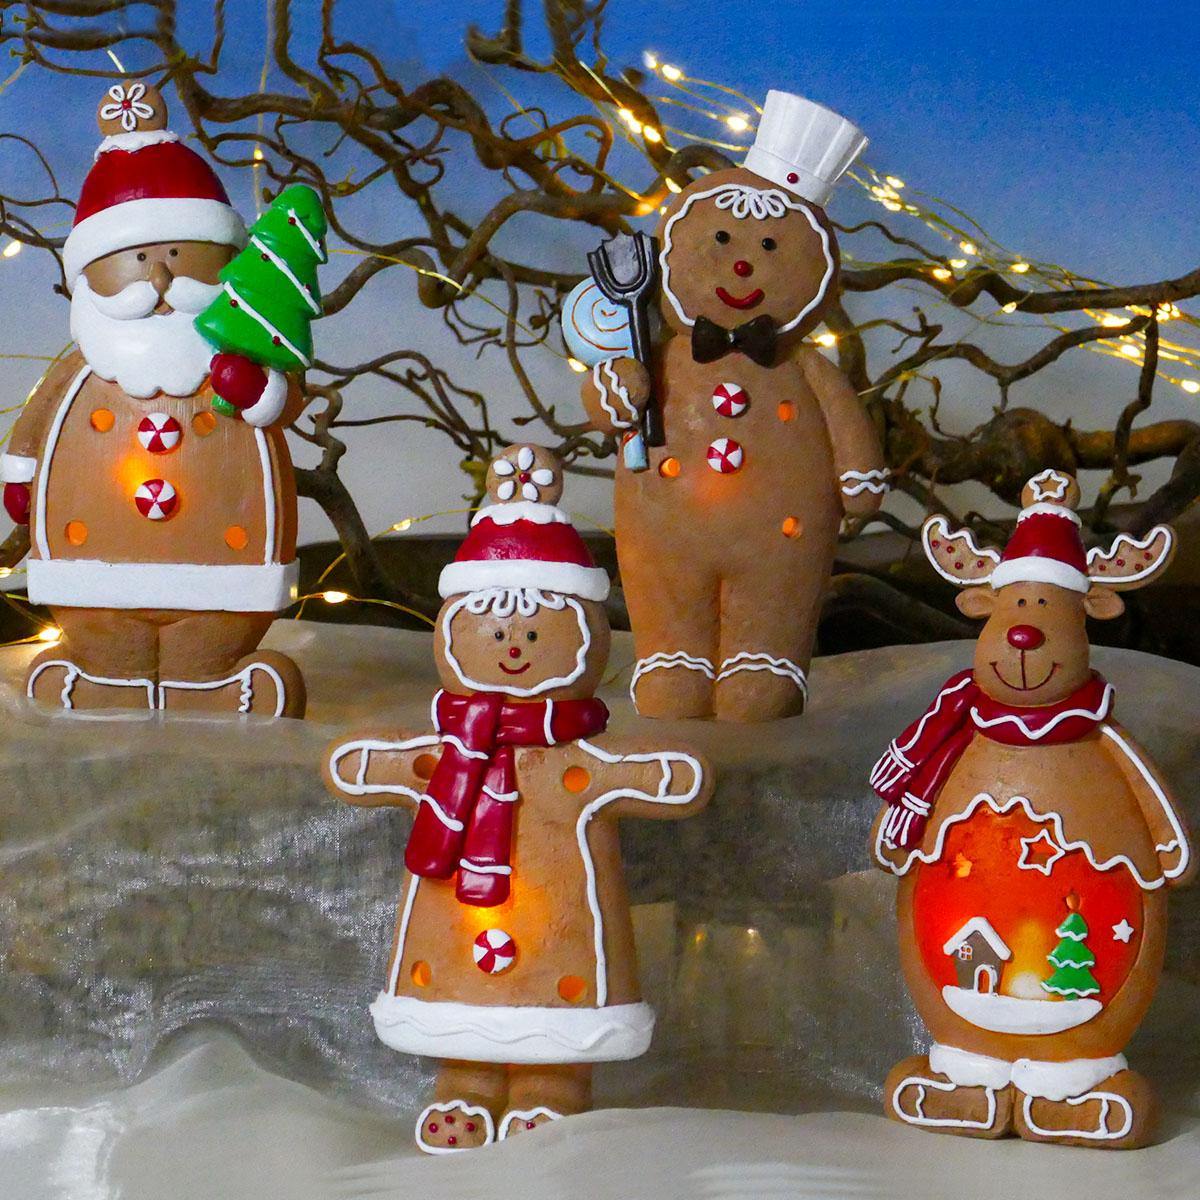 Lebkuchenfiguren mit LED-Beleuchtung Image